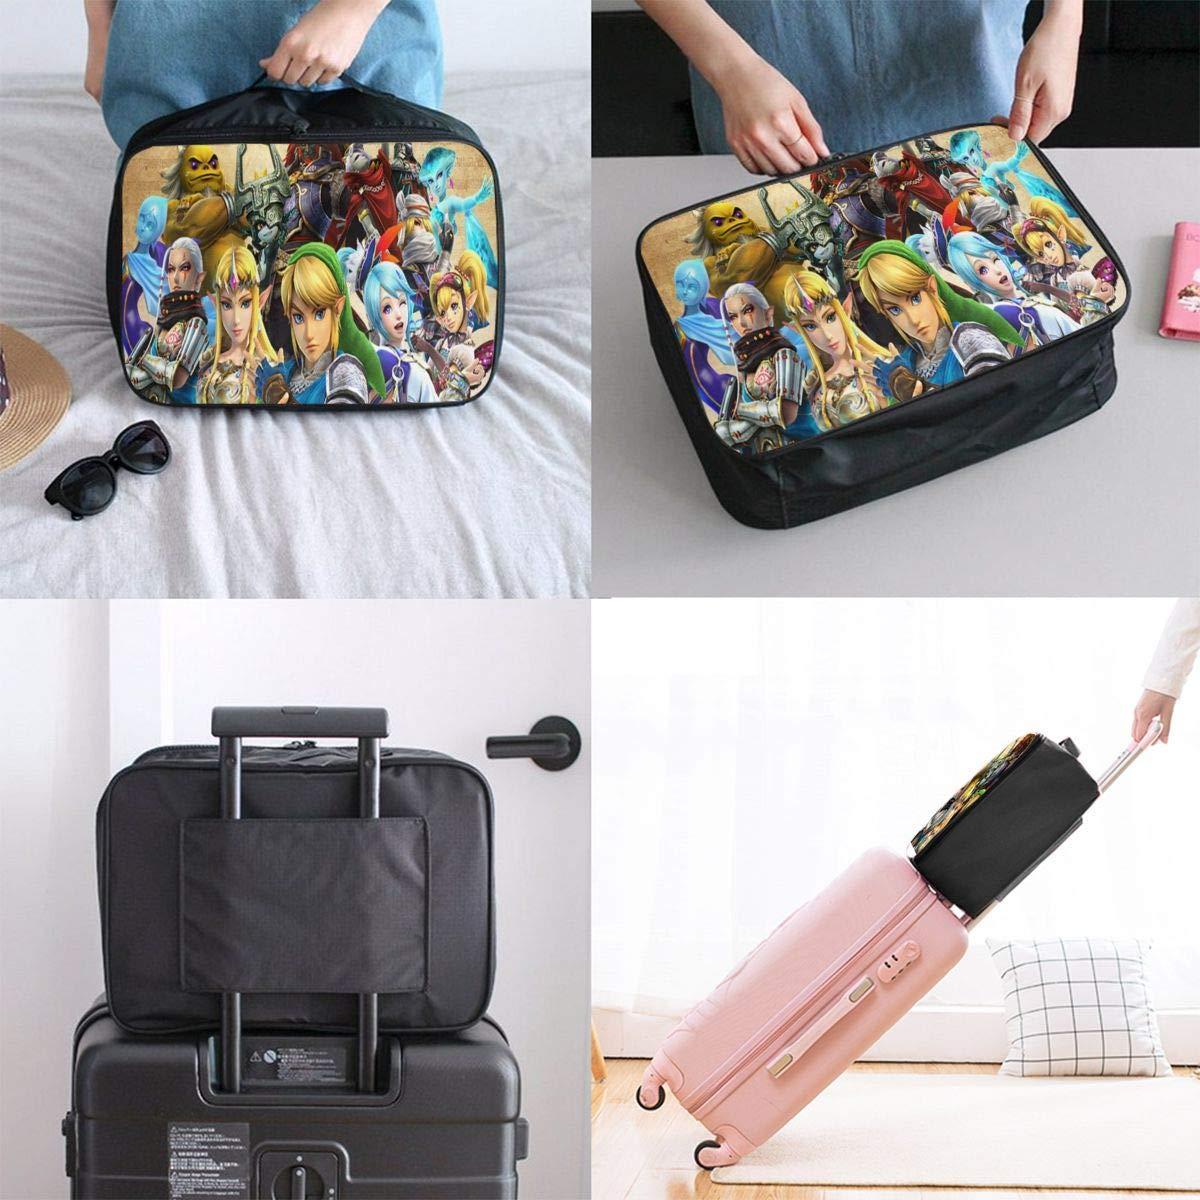 BOKAIKAI1306 Handsome Legend Zelda Unisex Adults Fashion Lightweight Large Capacity Portable Large Travel Duffel Bag Mens Womens Luggage Bag 3D Print DIY Boarding Box